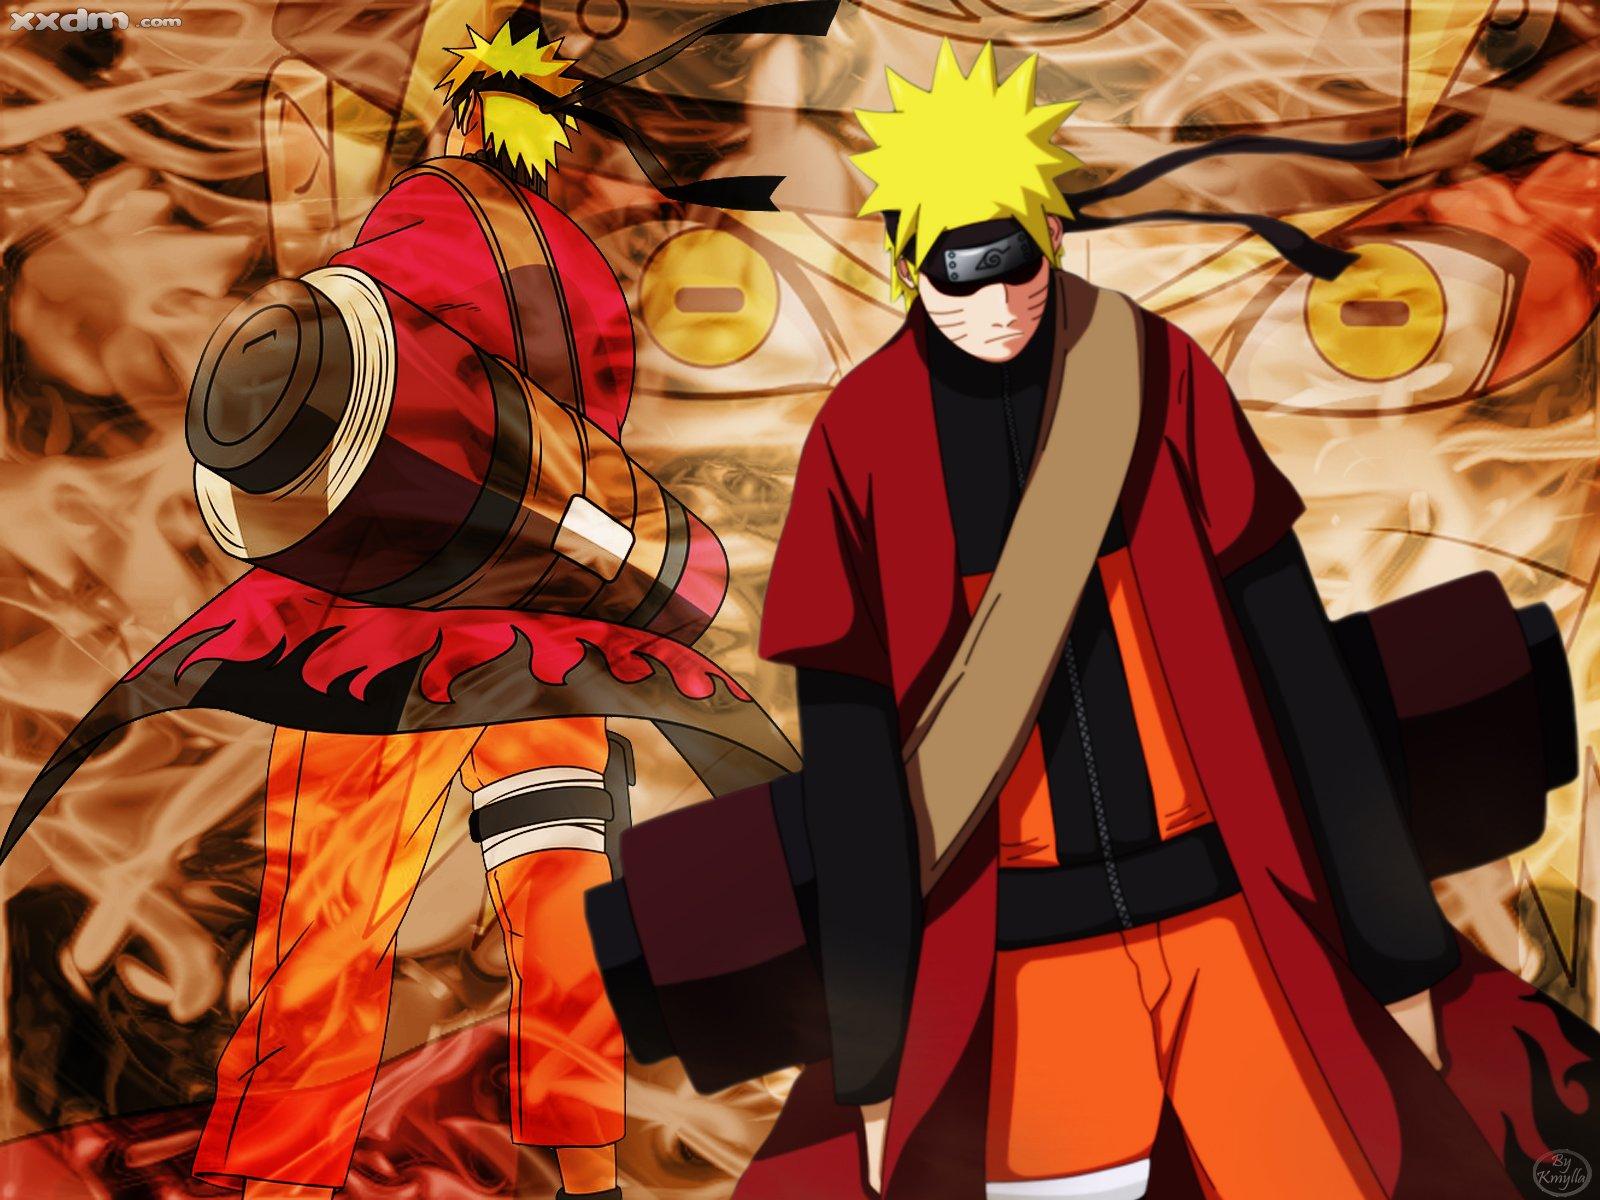 Naruto Shippuden Wallpaper Celular: Naruto Shippuuden Images NARUTO GROUP HD Wallpaper And